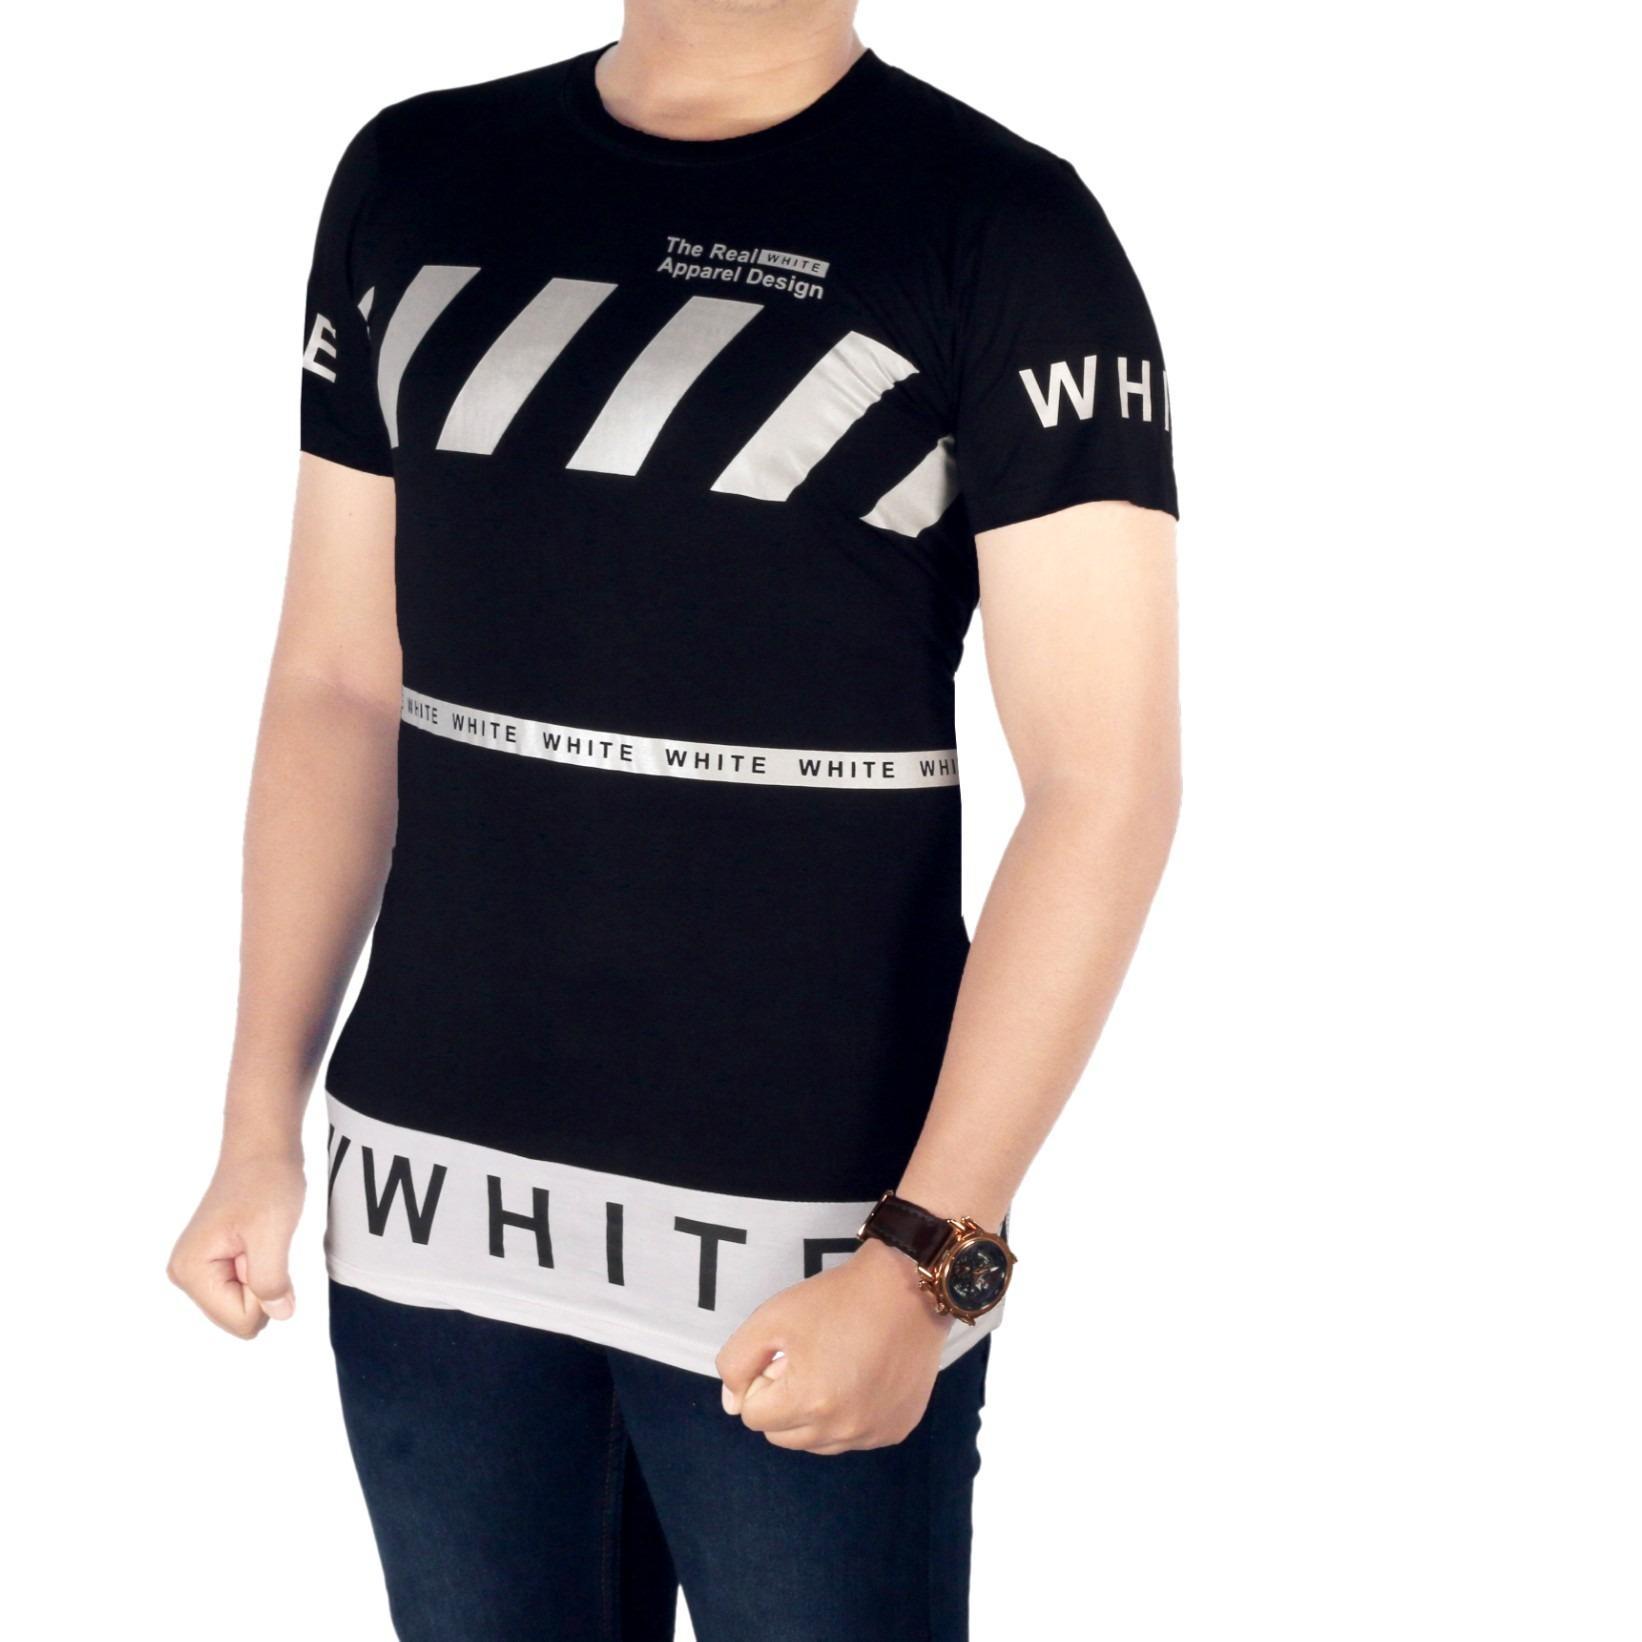 Review Dgm Fashion1 Baju Kaos Lengan Pendek Distro Baju Kaos Cucian Pendek Baju Kaos Lengan Pendek Baju Kaos Bermotiv Baju Kaos Pria Baju Kaos Pria Baju Kaos Cucian Panjang Baju Kaos Bermotiv Pria Baju Kaos Nn 5504 Hitam Terbaru